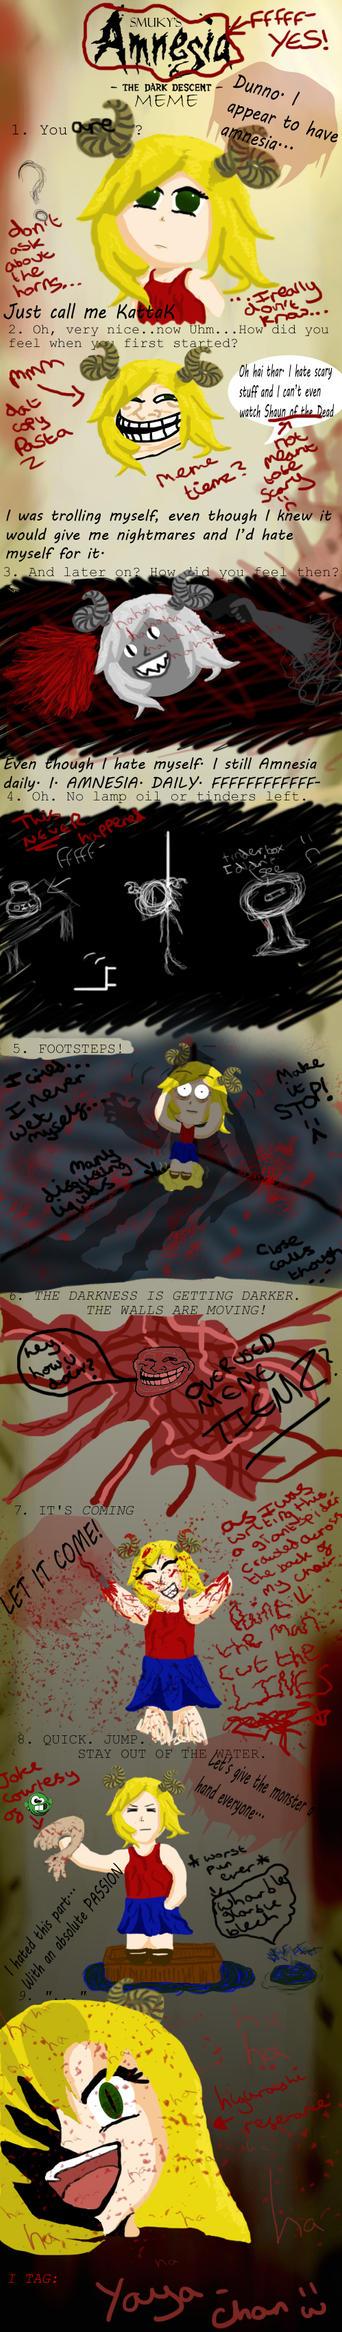 Amnesia: The Dark Descent-Meme by 5tarfishLawlietLover